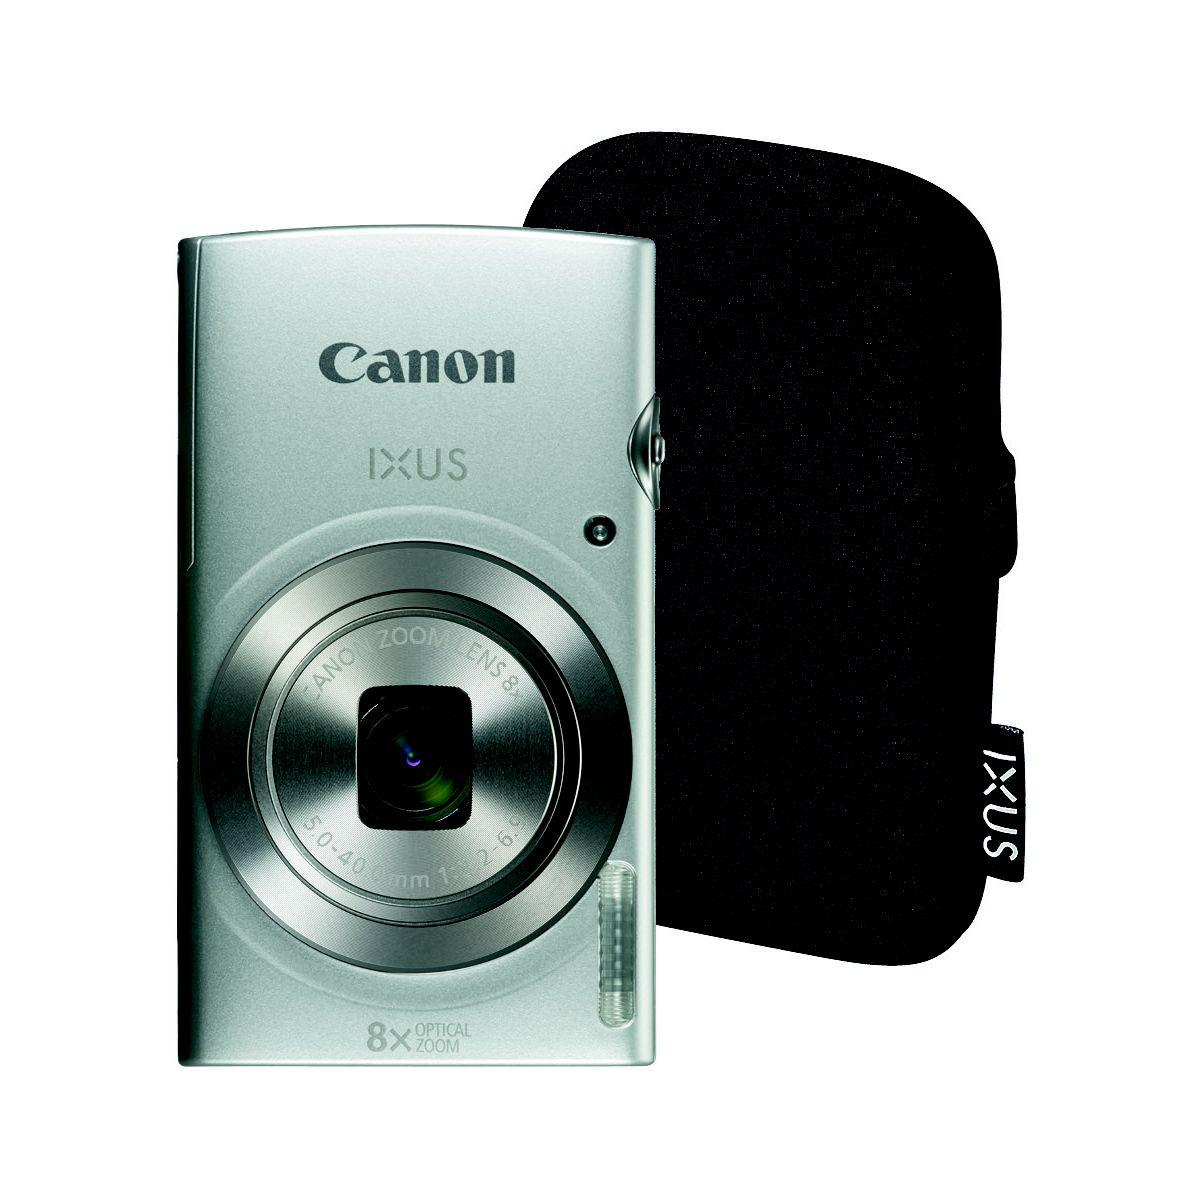 Appareil photo compact canon ixus 185 silver + etui (photo)